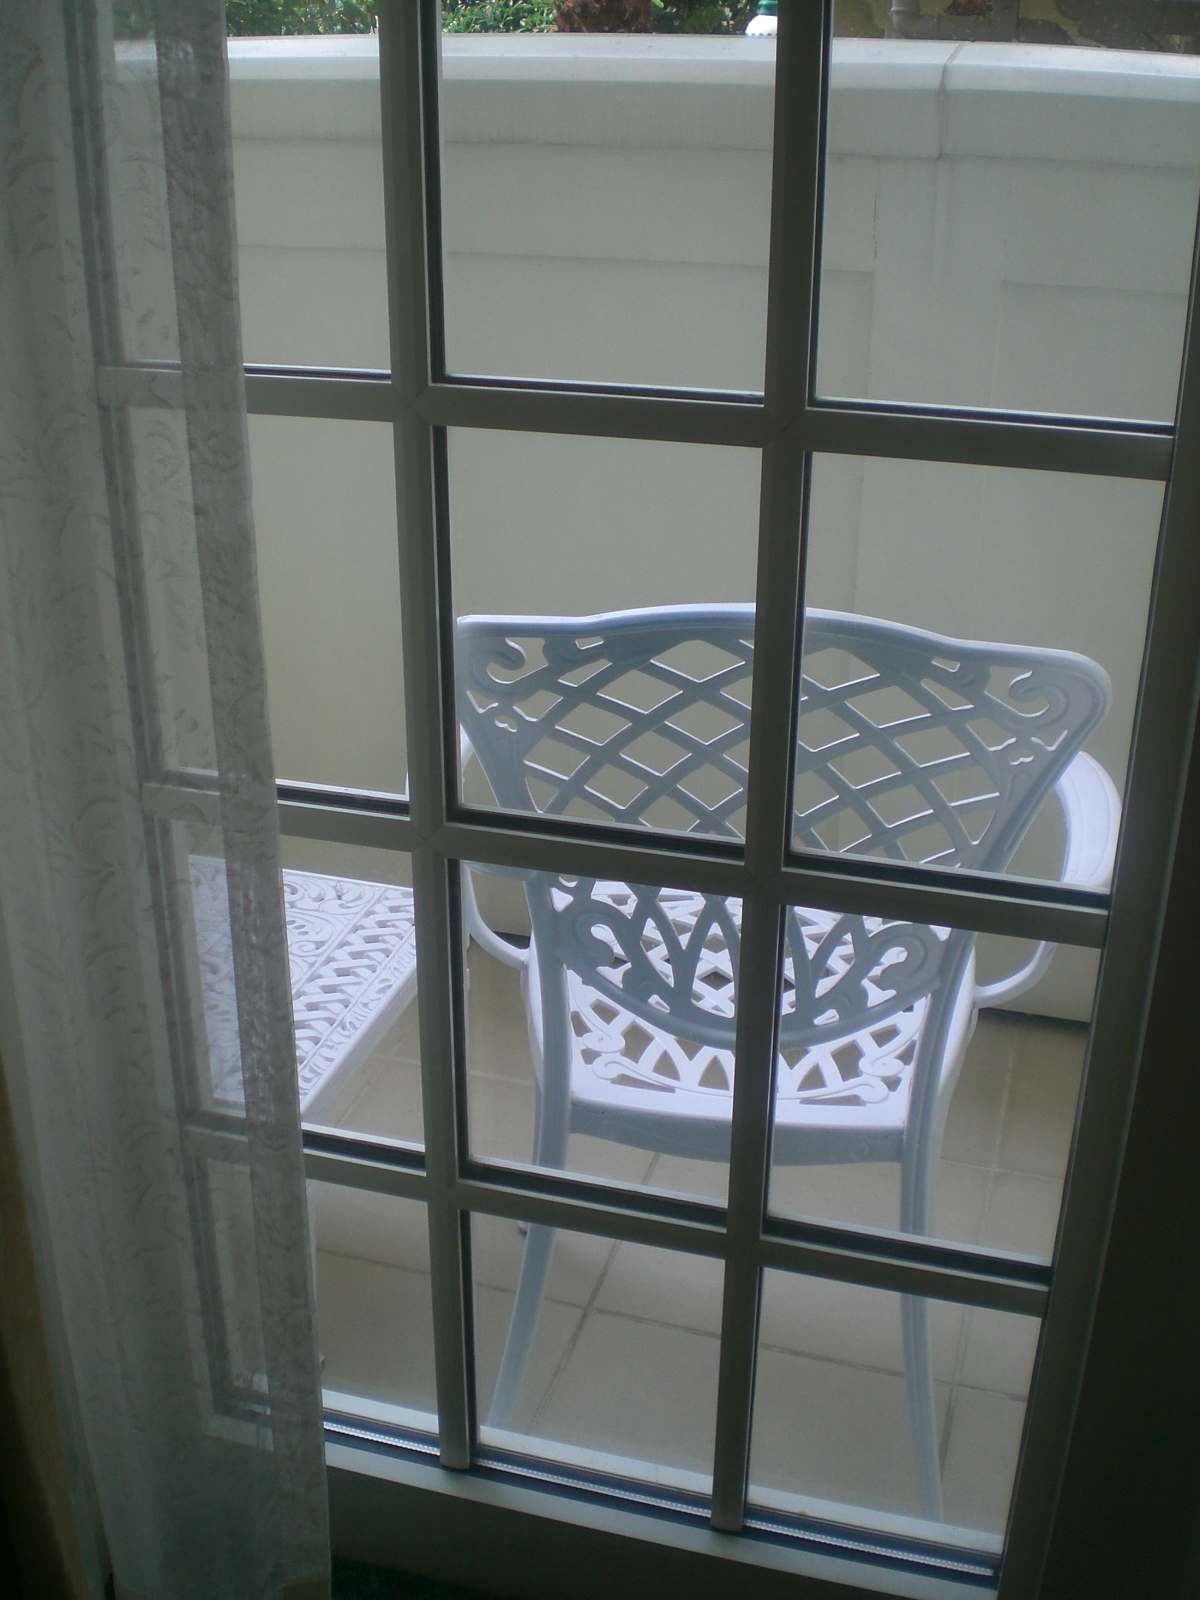 File Hk Disneyland Hotel Room ə�台 Balcony Glass Door Ƥ�子 Armchair In White Jpg Wikimedia Commons